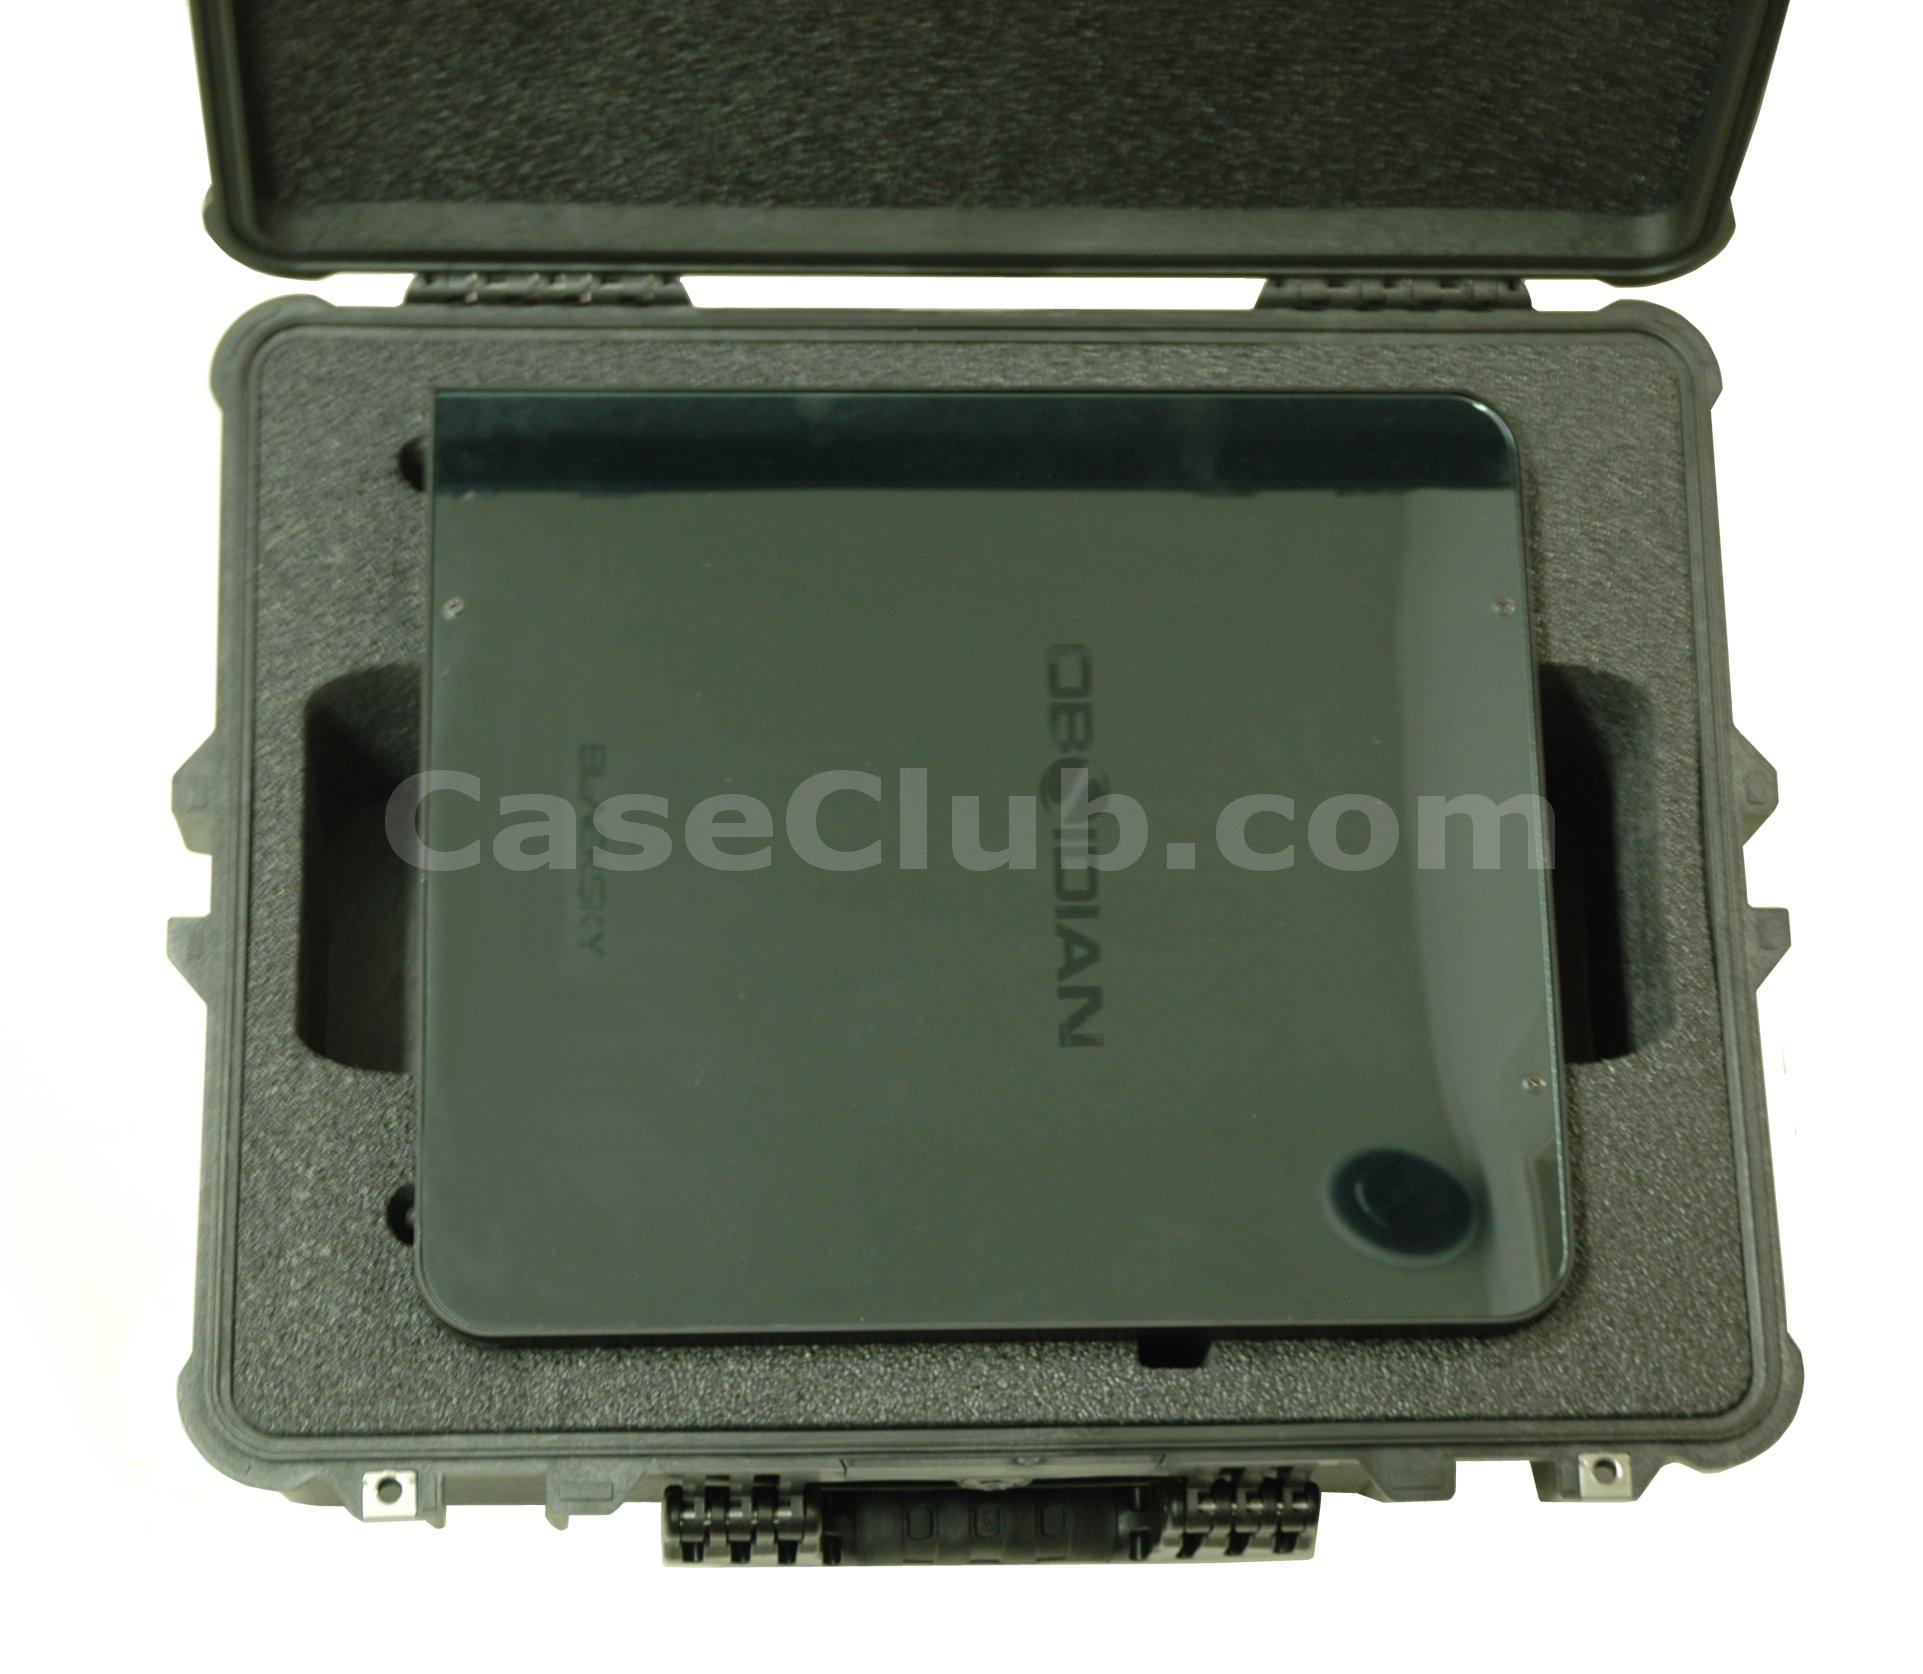 Pelican™ 1600 Case Custom Foam Example: Obsidian Computer Case